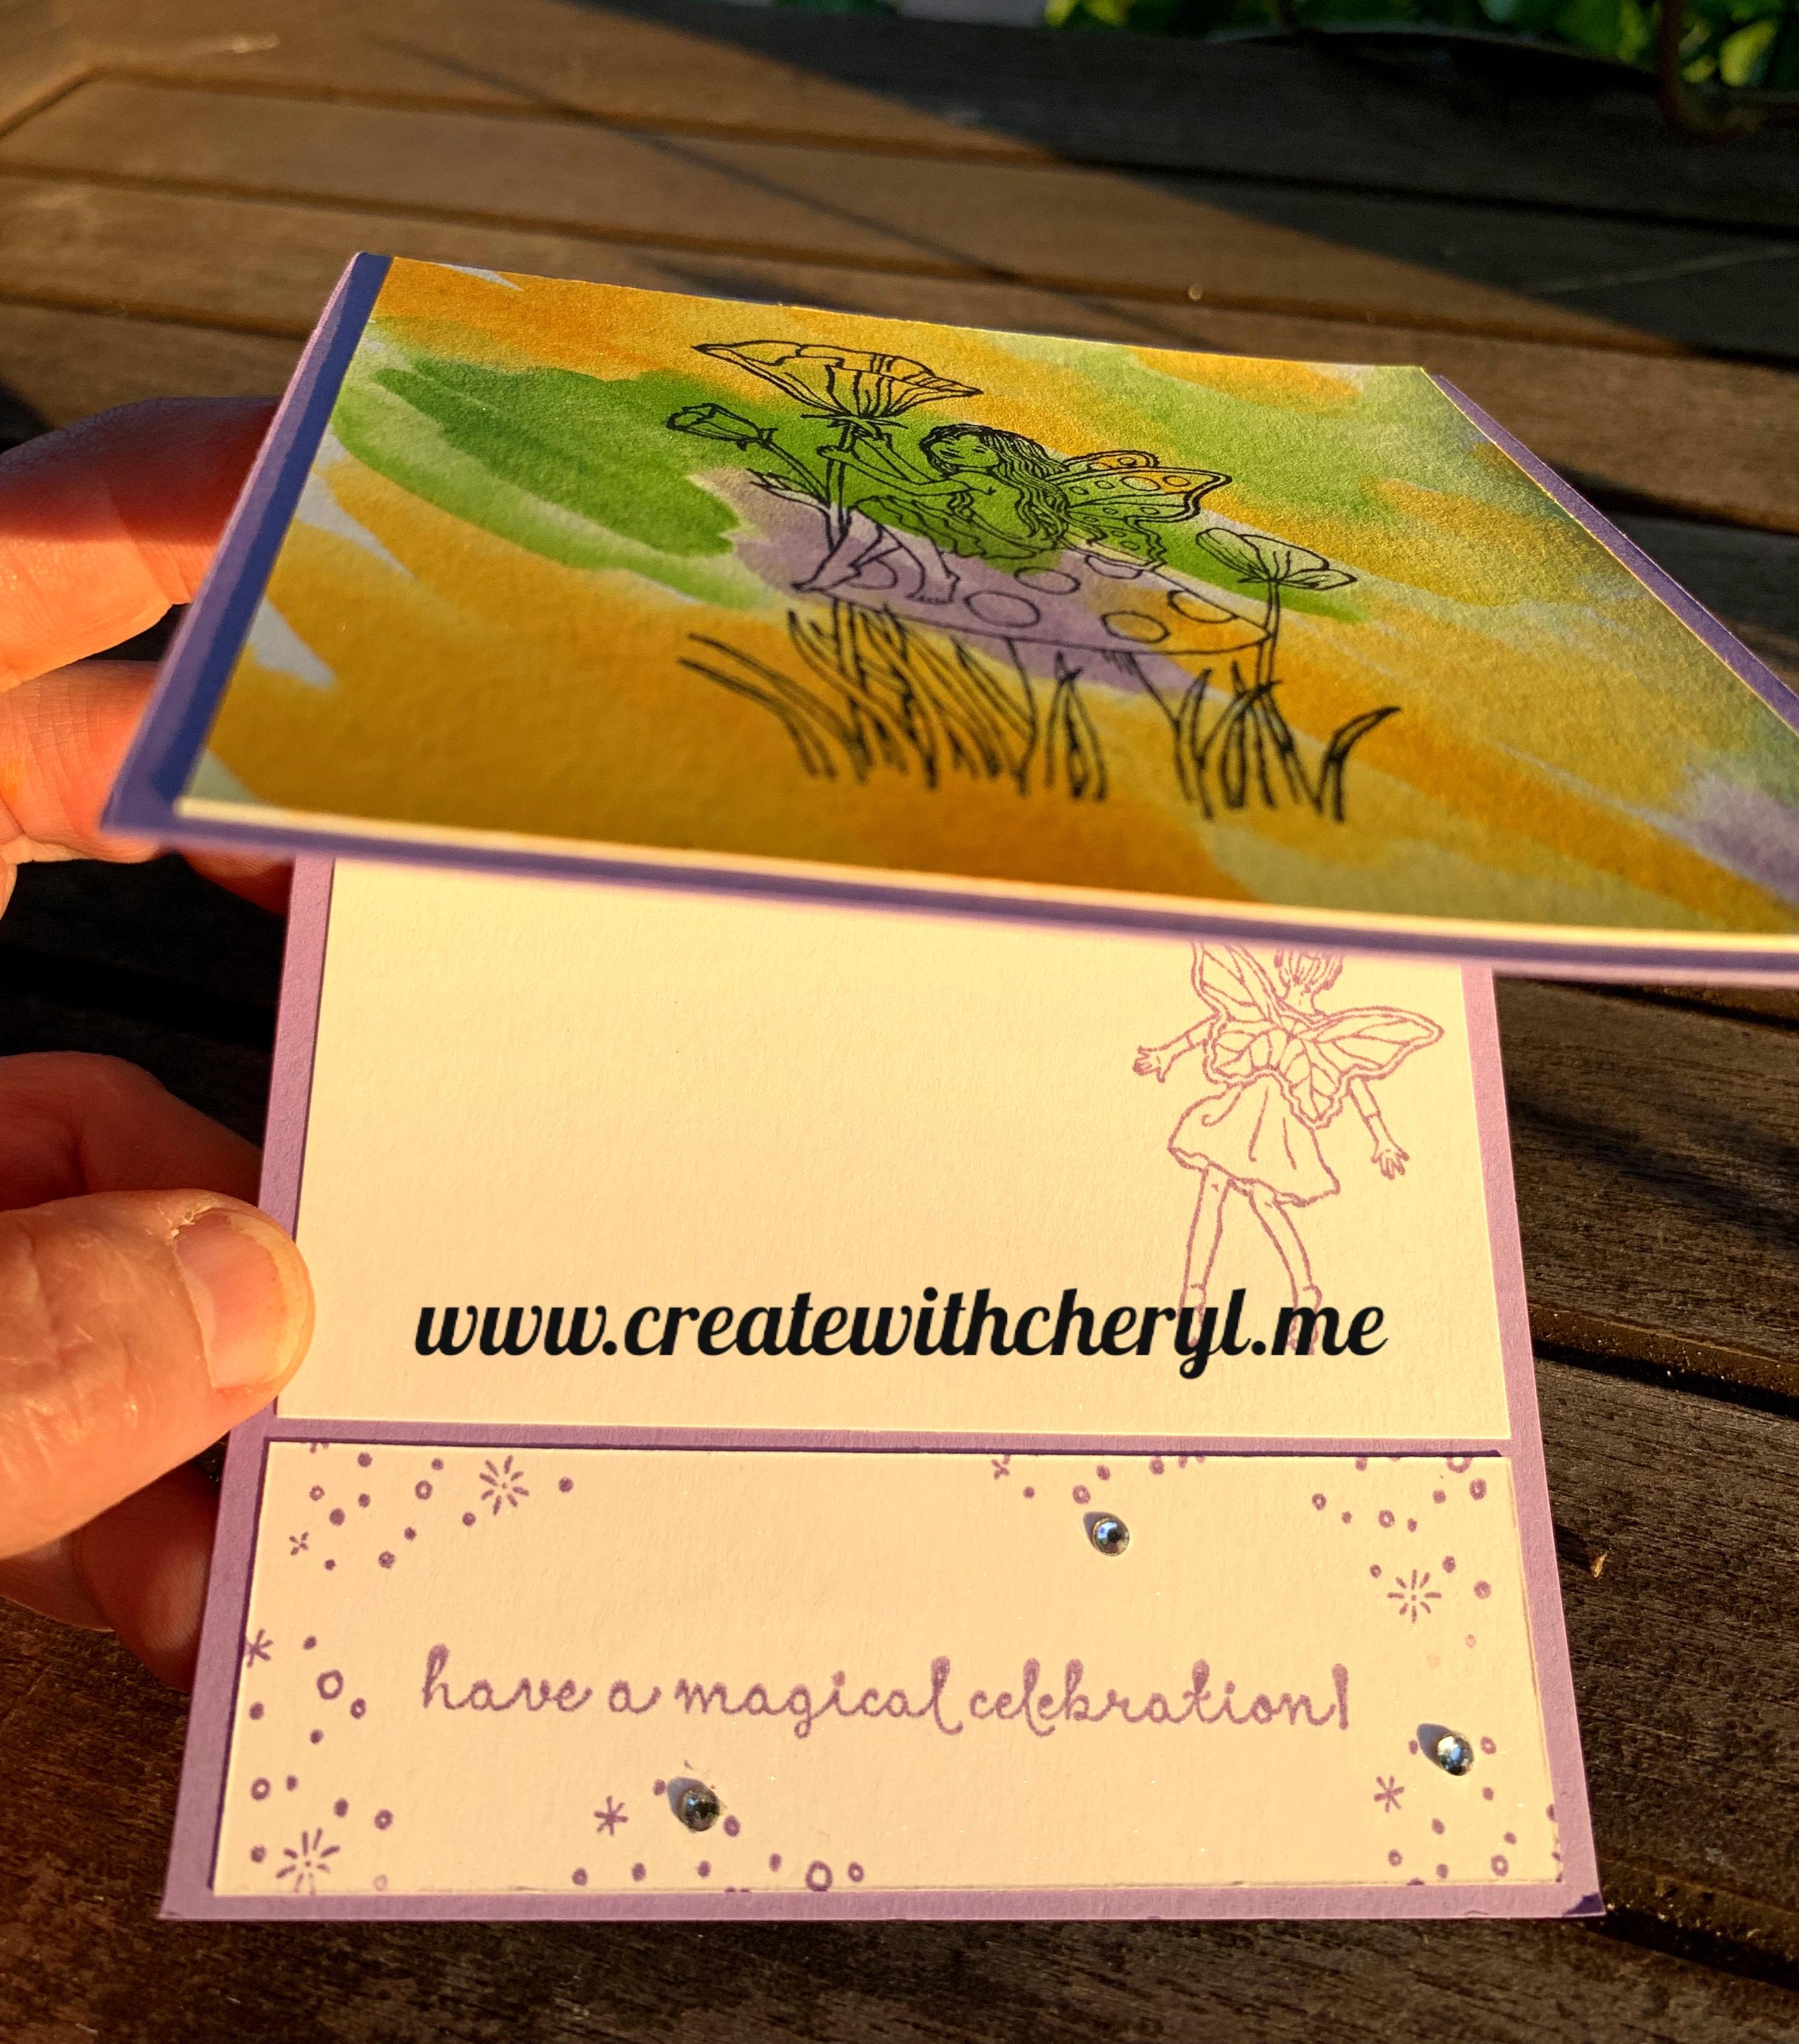 #Kre8torsbloghop #fairycelebration #createwithcheryl #colorchallenge